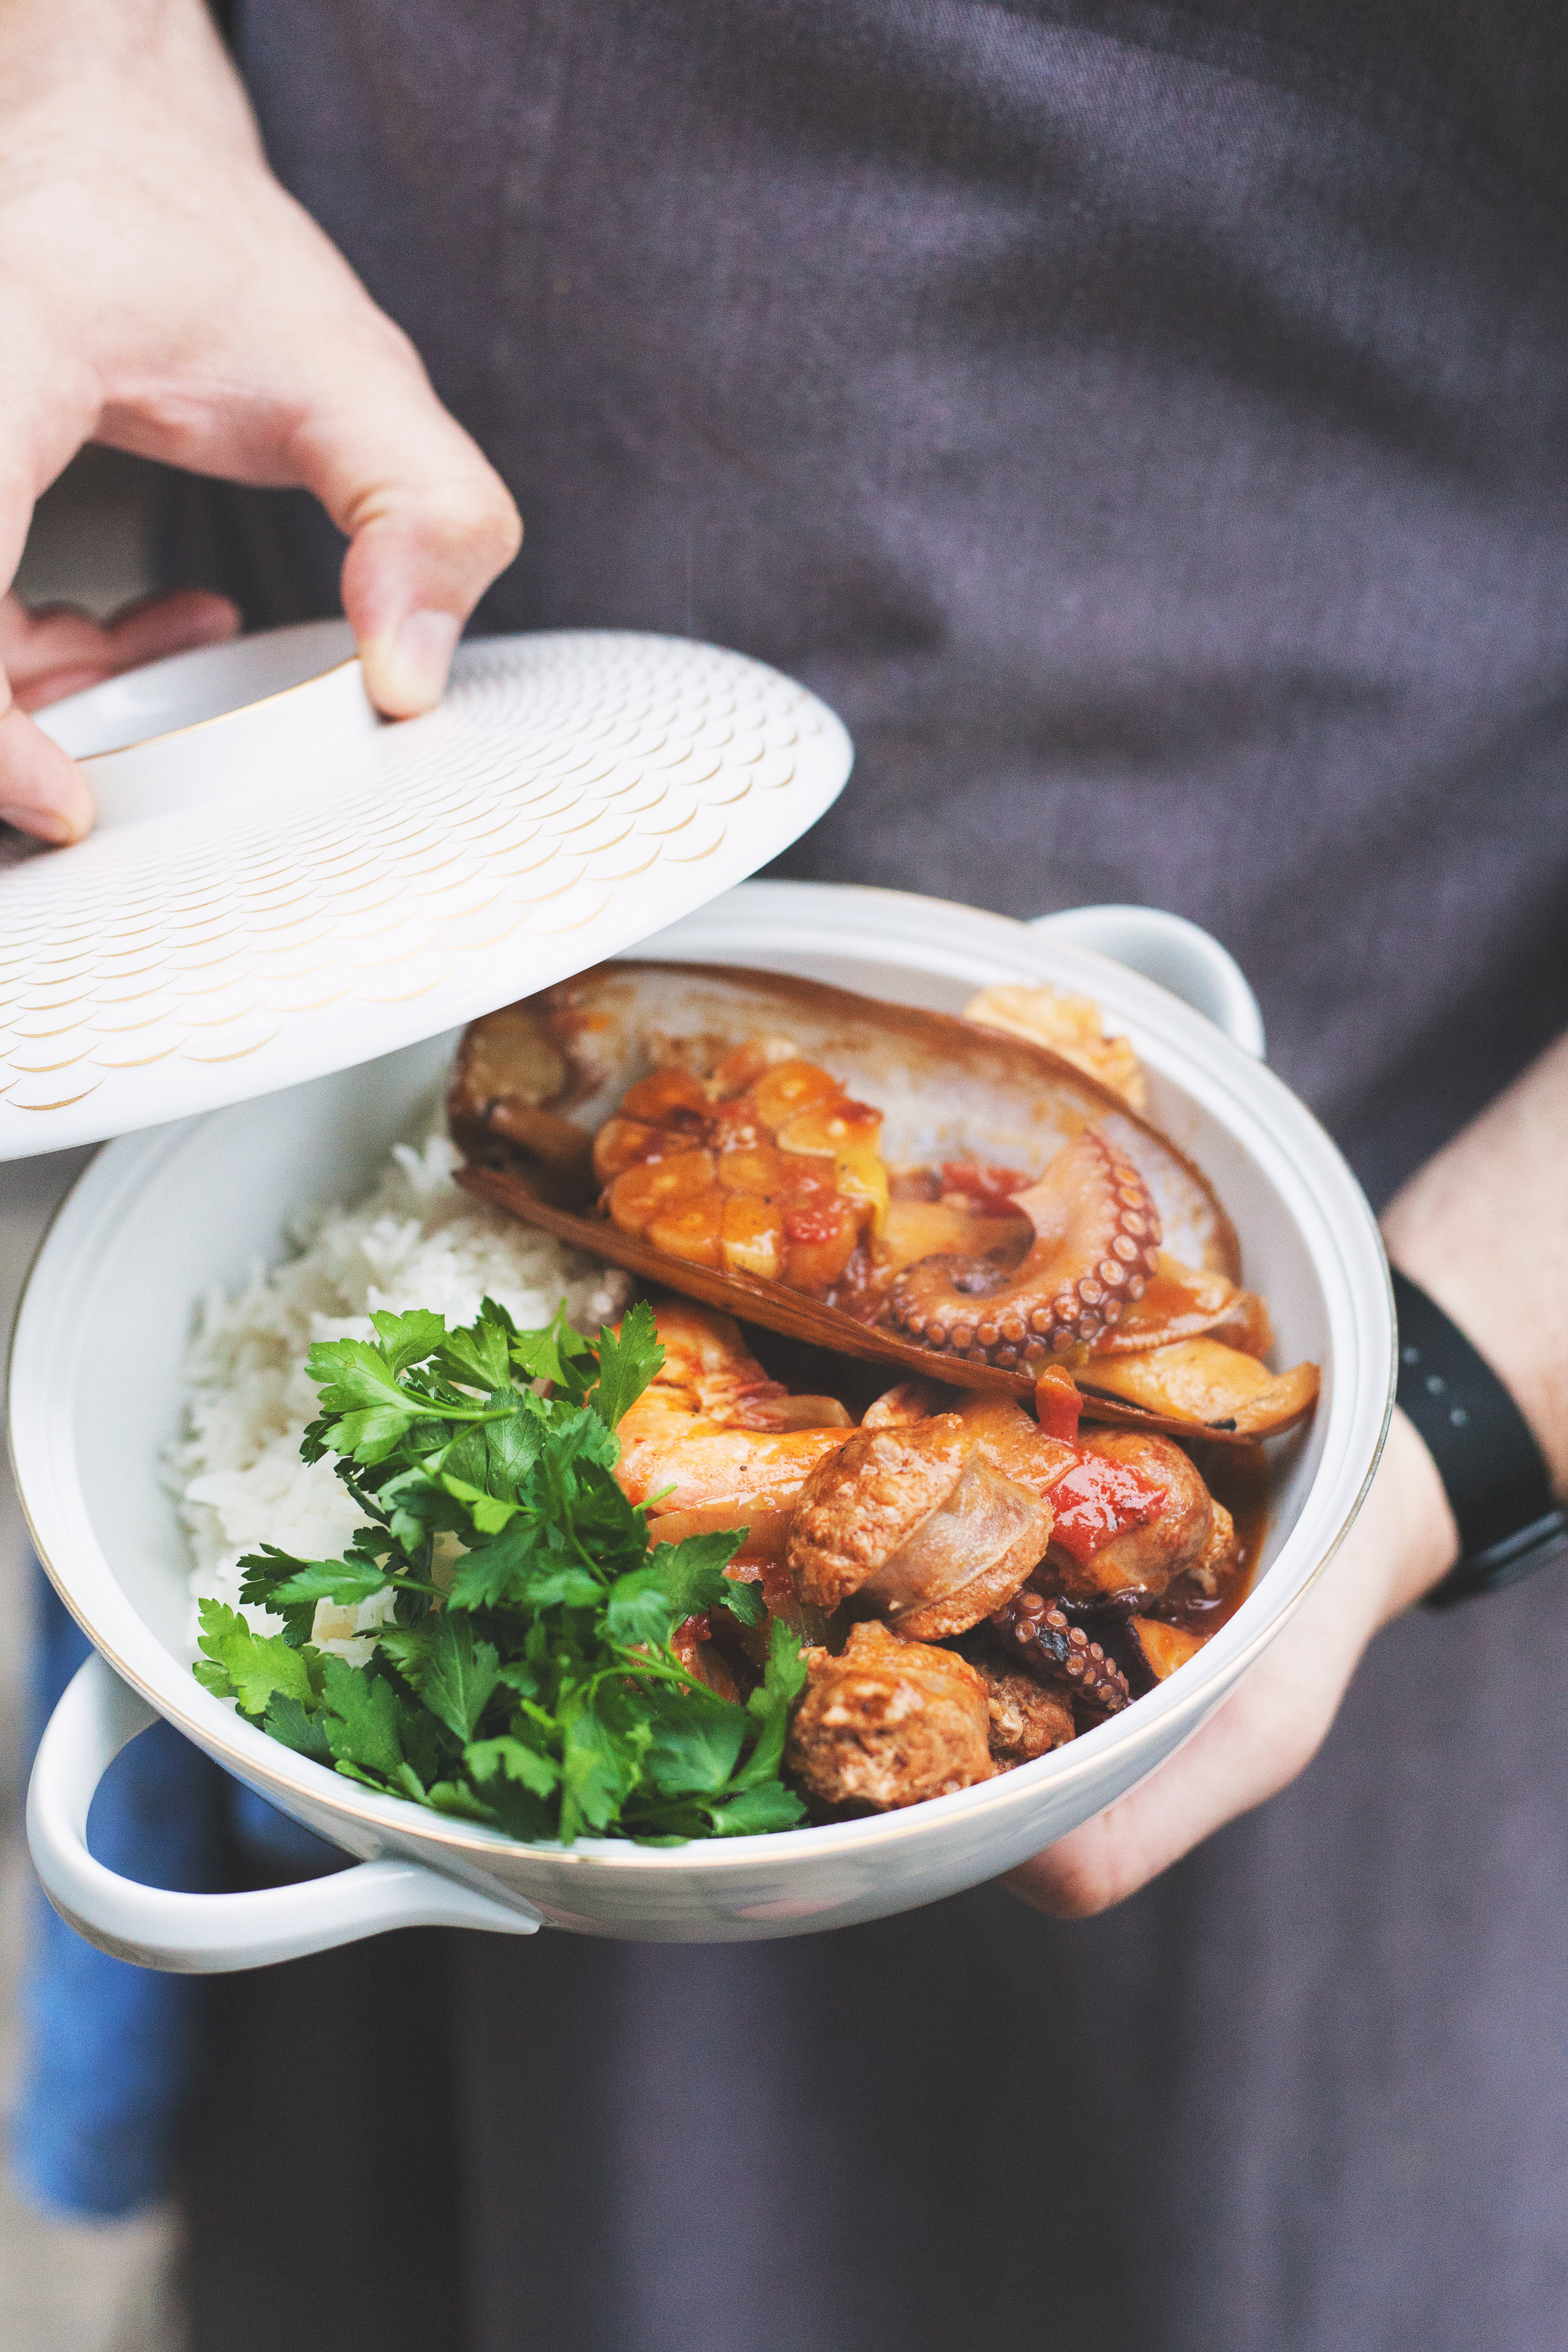 Gourmet gumbo recipe